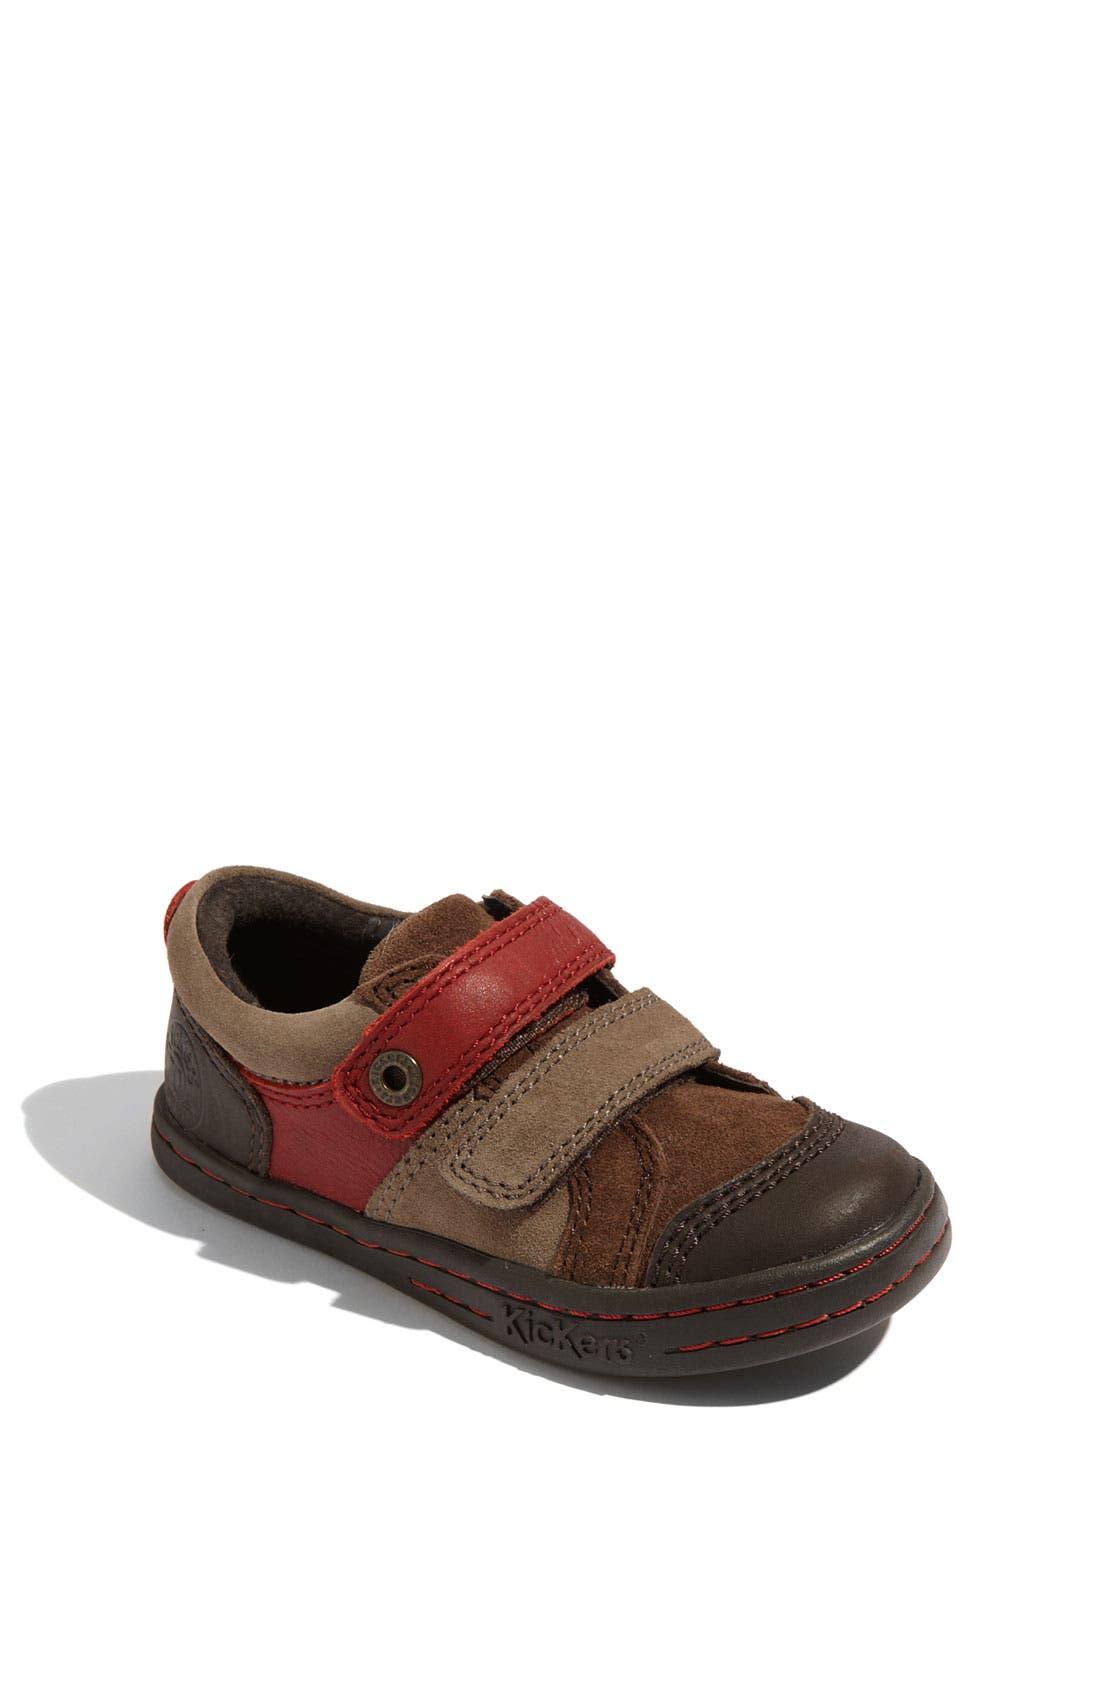 Alternate Image 1 Selected - Kickers 'Jump' Shoe (Toddler)